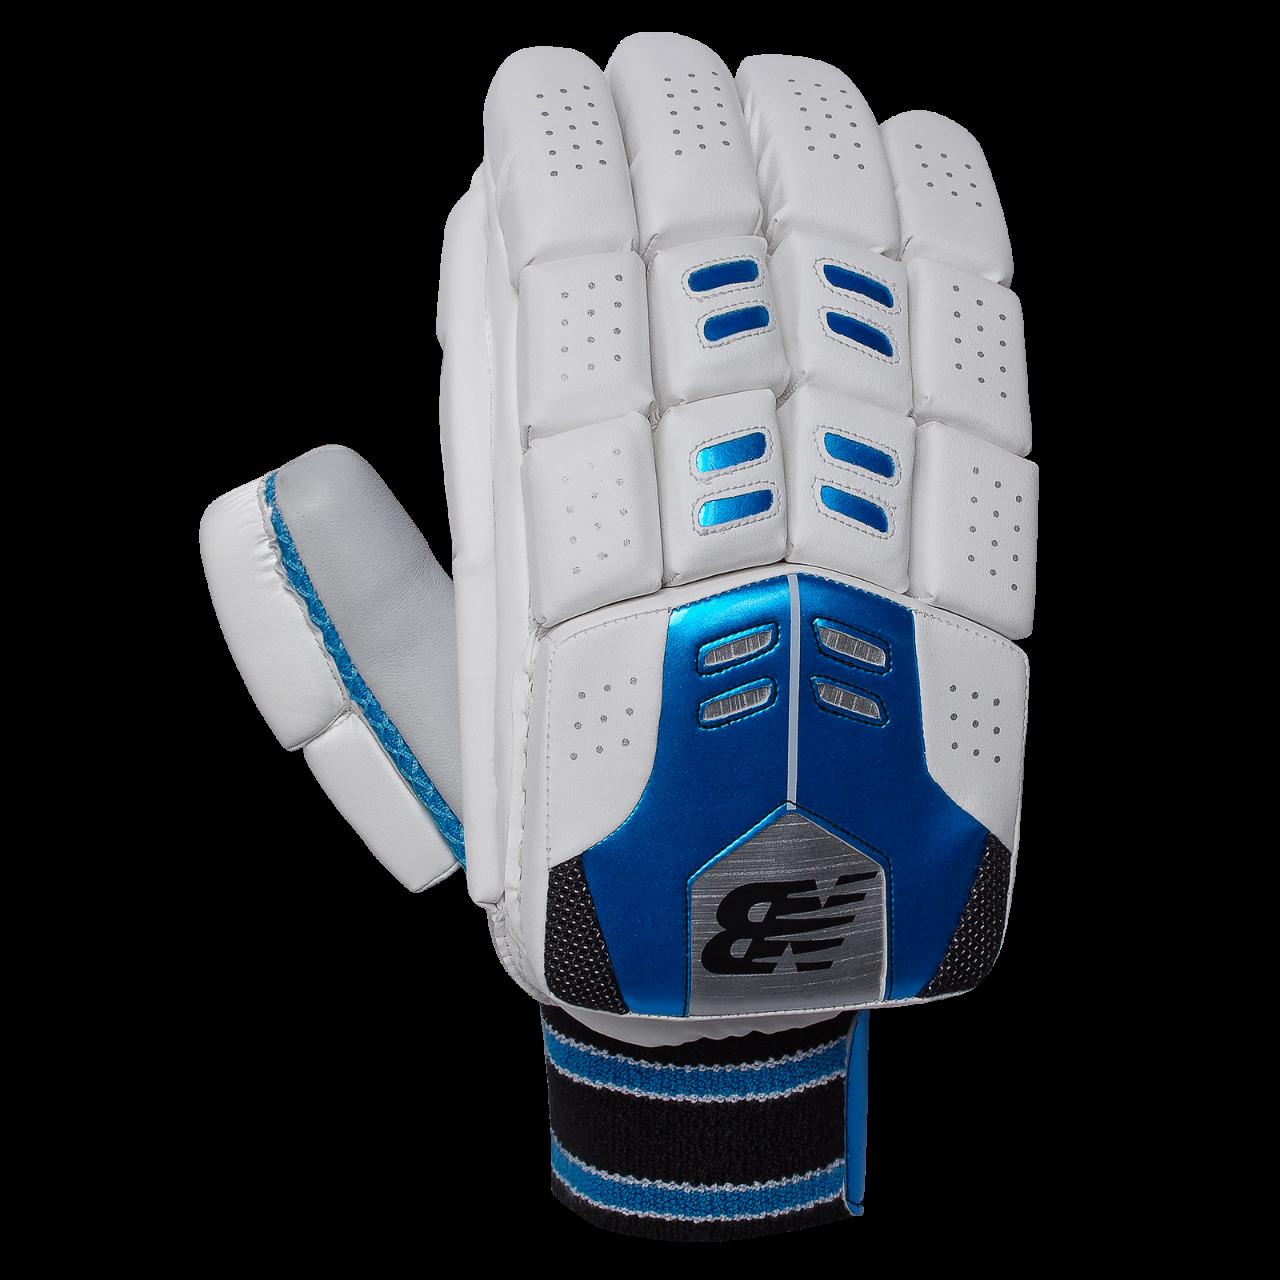 2020 New Balance DC 680 Junior Batting Gloves